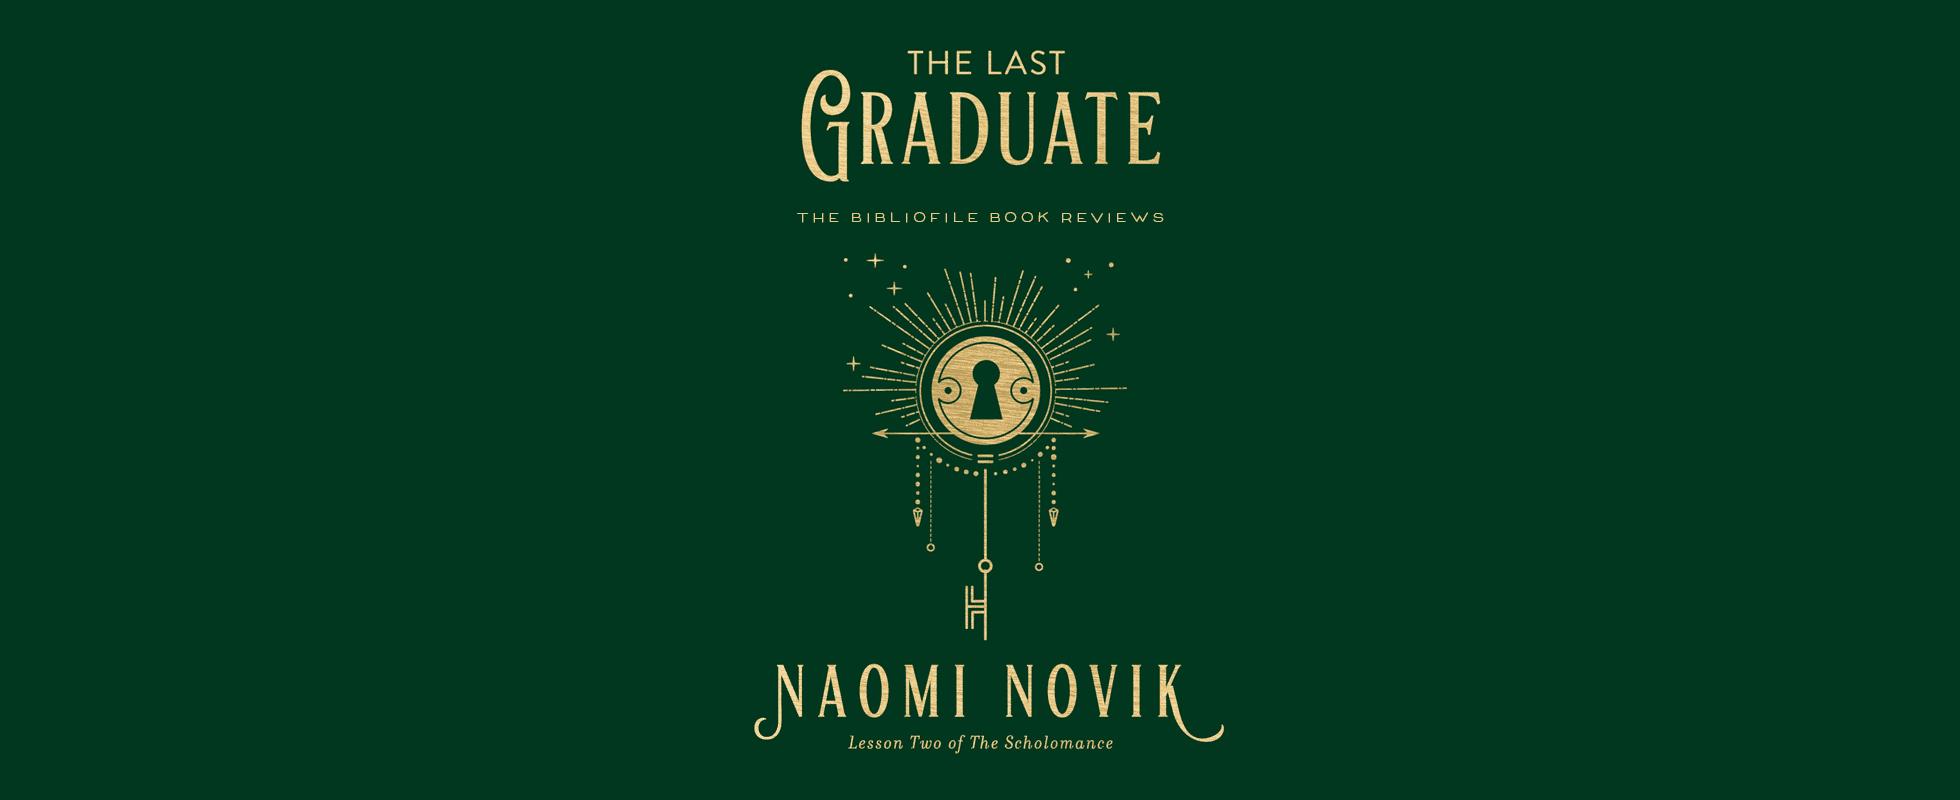 the last graduate (scholomance #2) by naomi novik book review synopsis summary recap spoilers